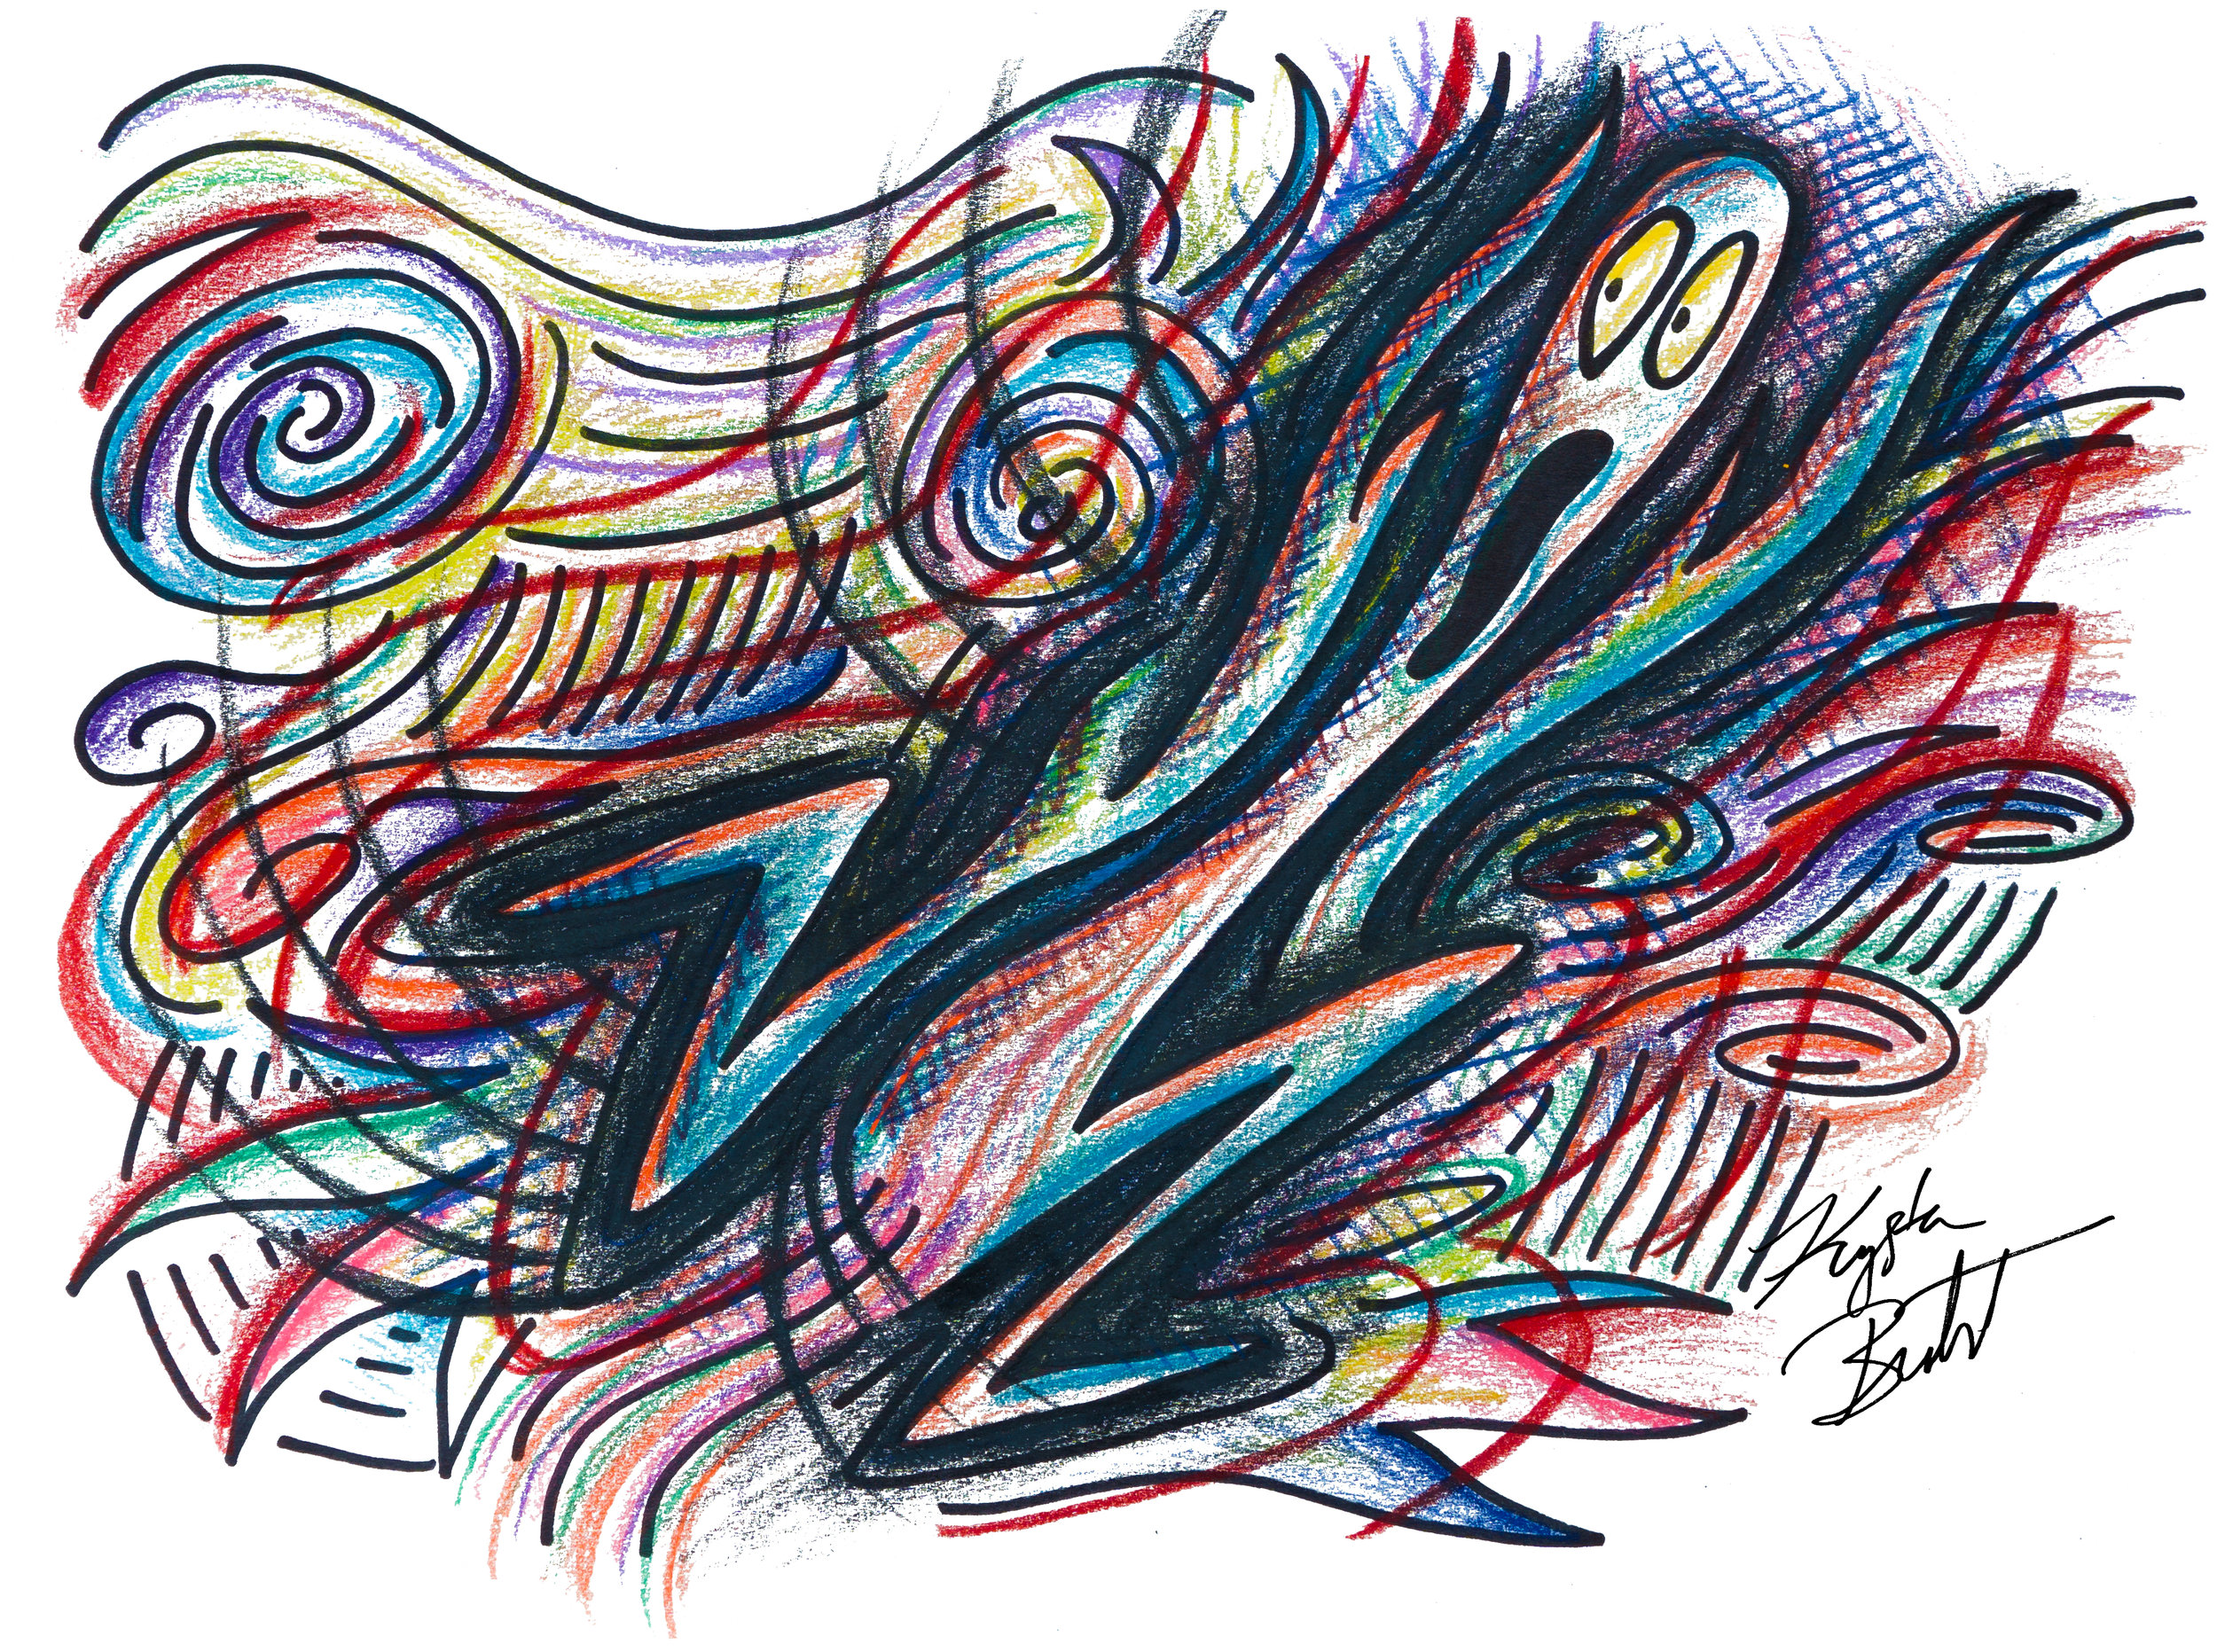 """#socialanxiety"" by Krysta Bernhardt (social anxiety, scream, drawing, pencil and ink)"